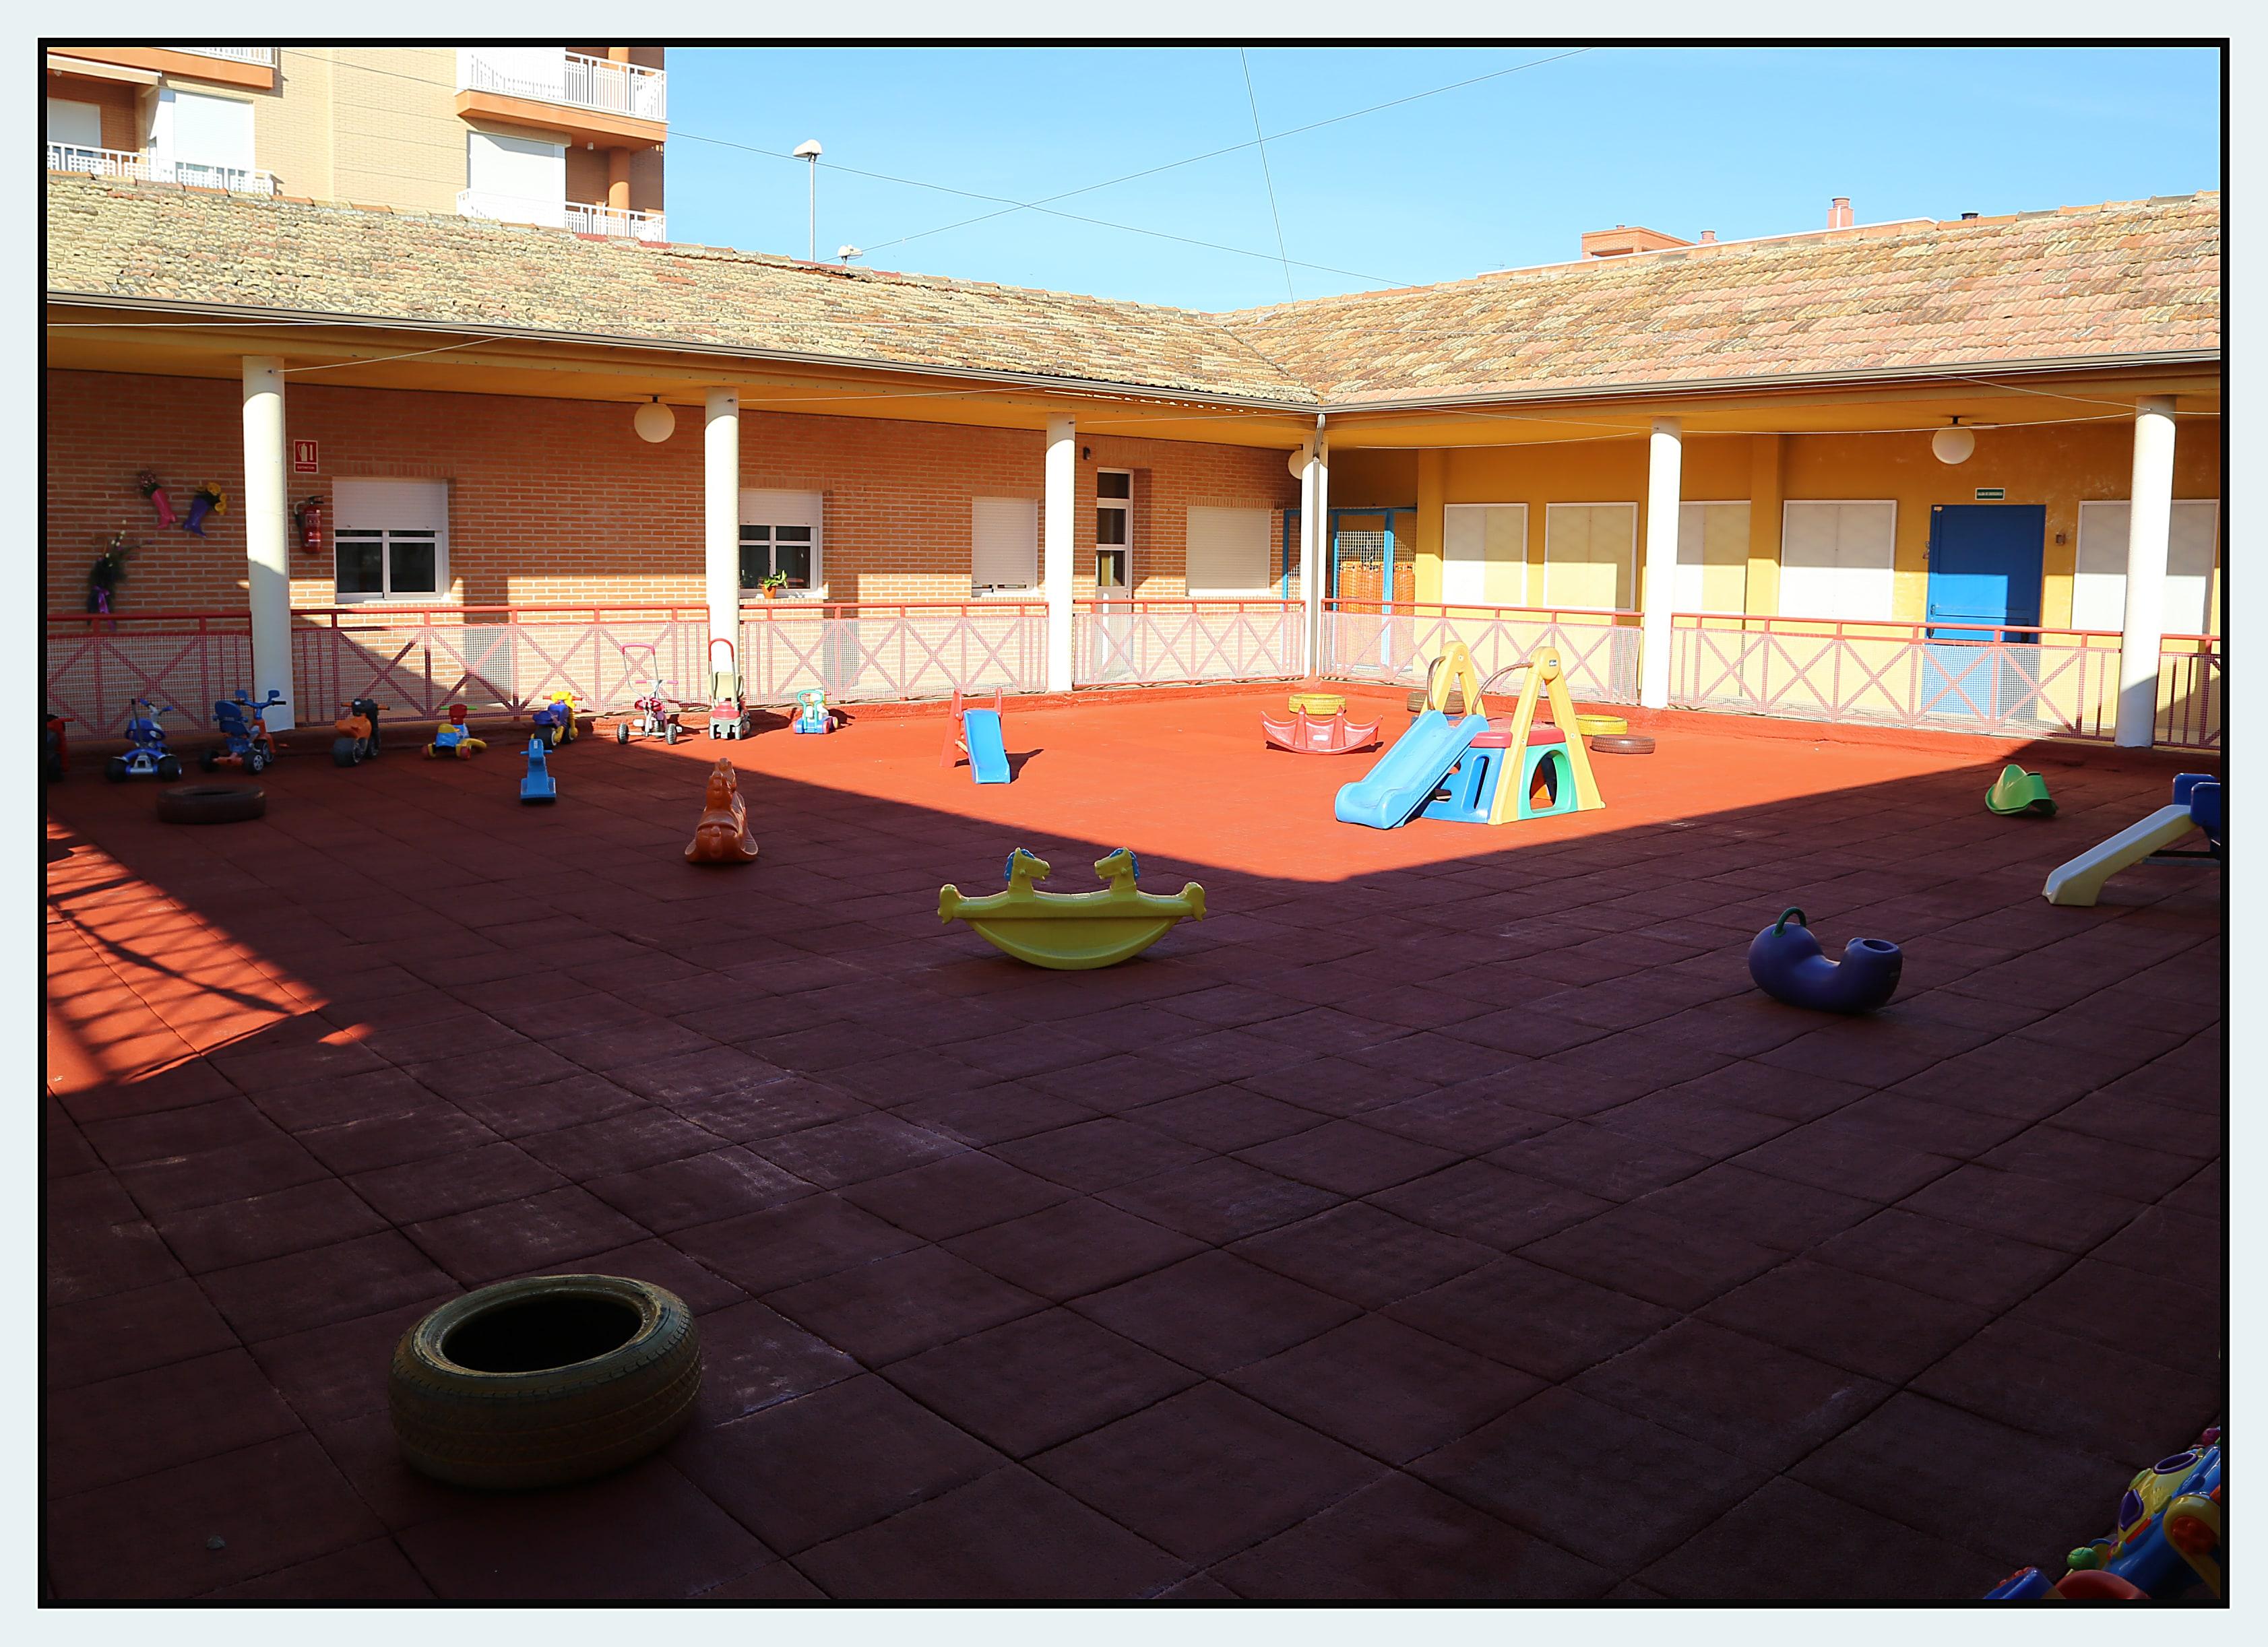 patio1-min